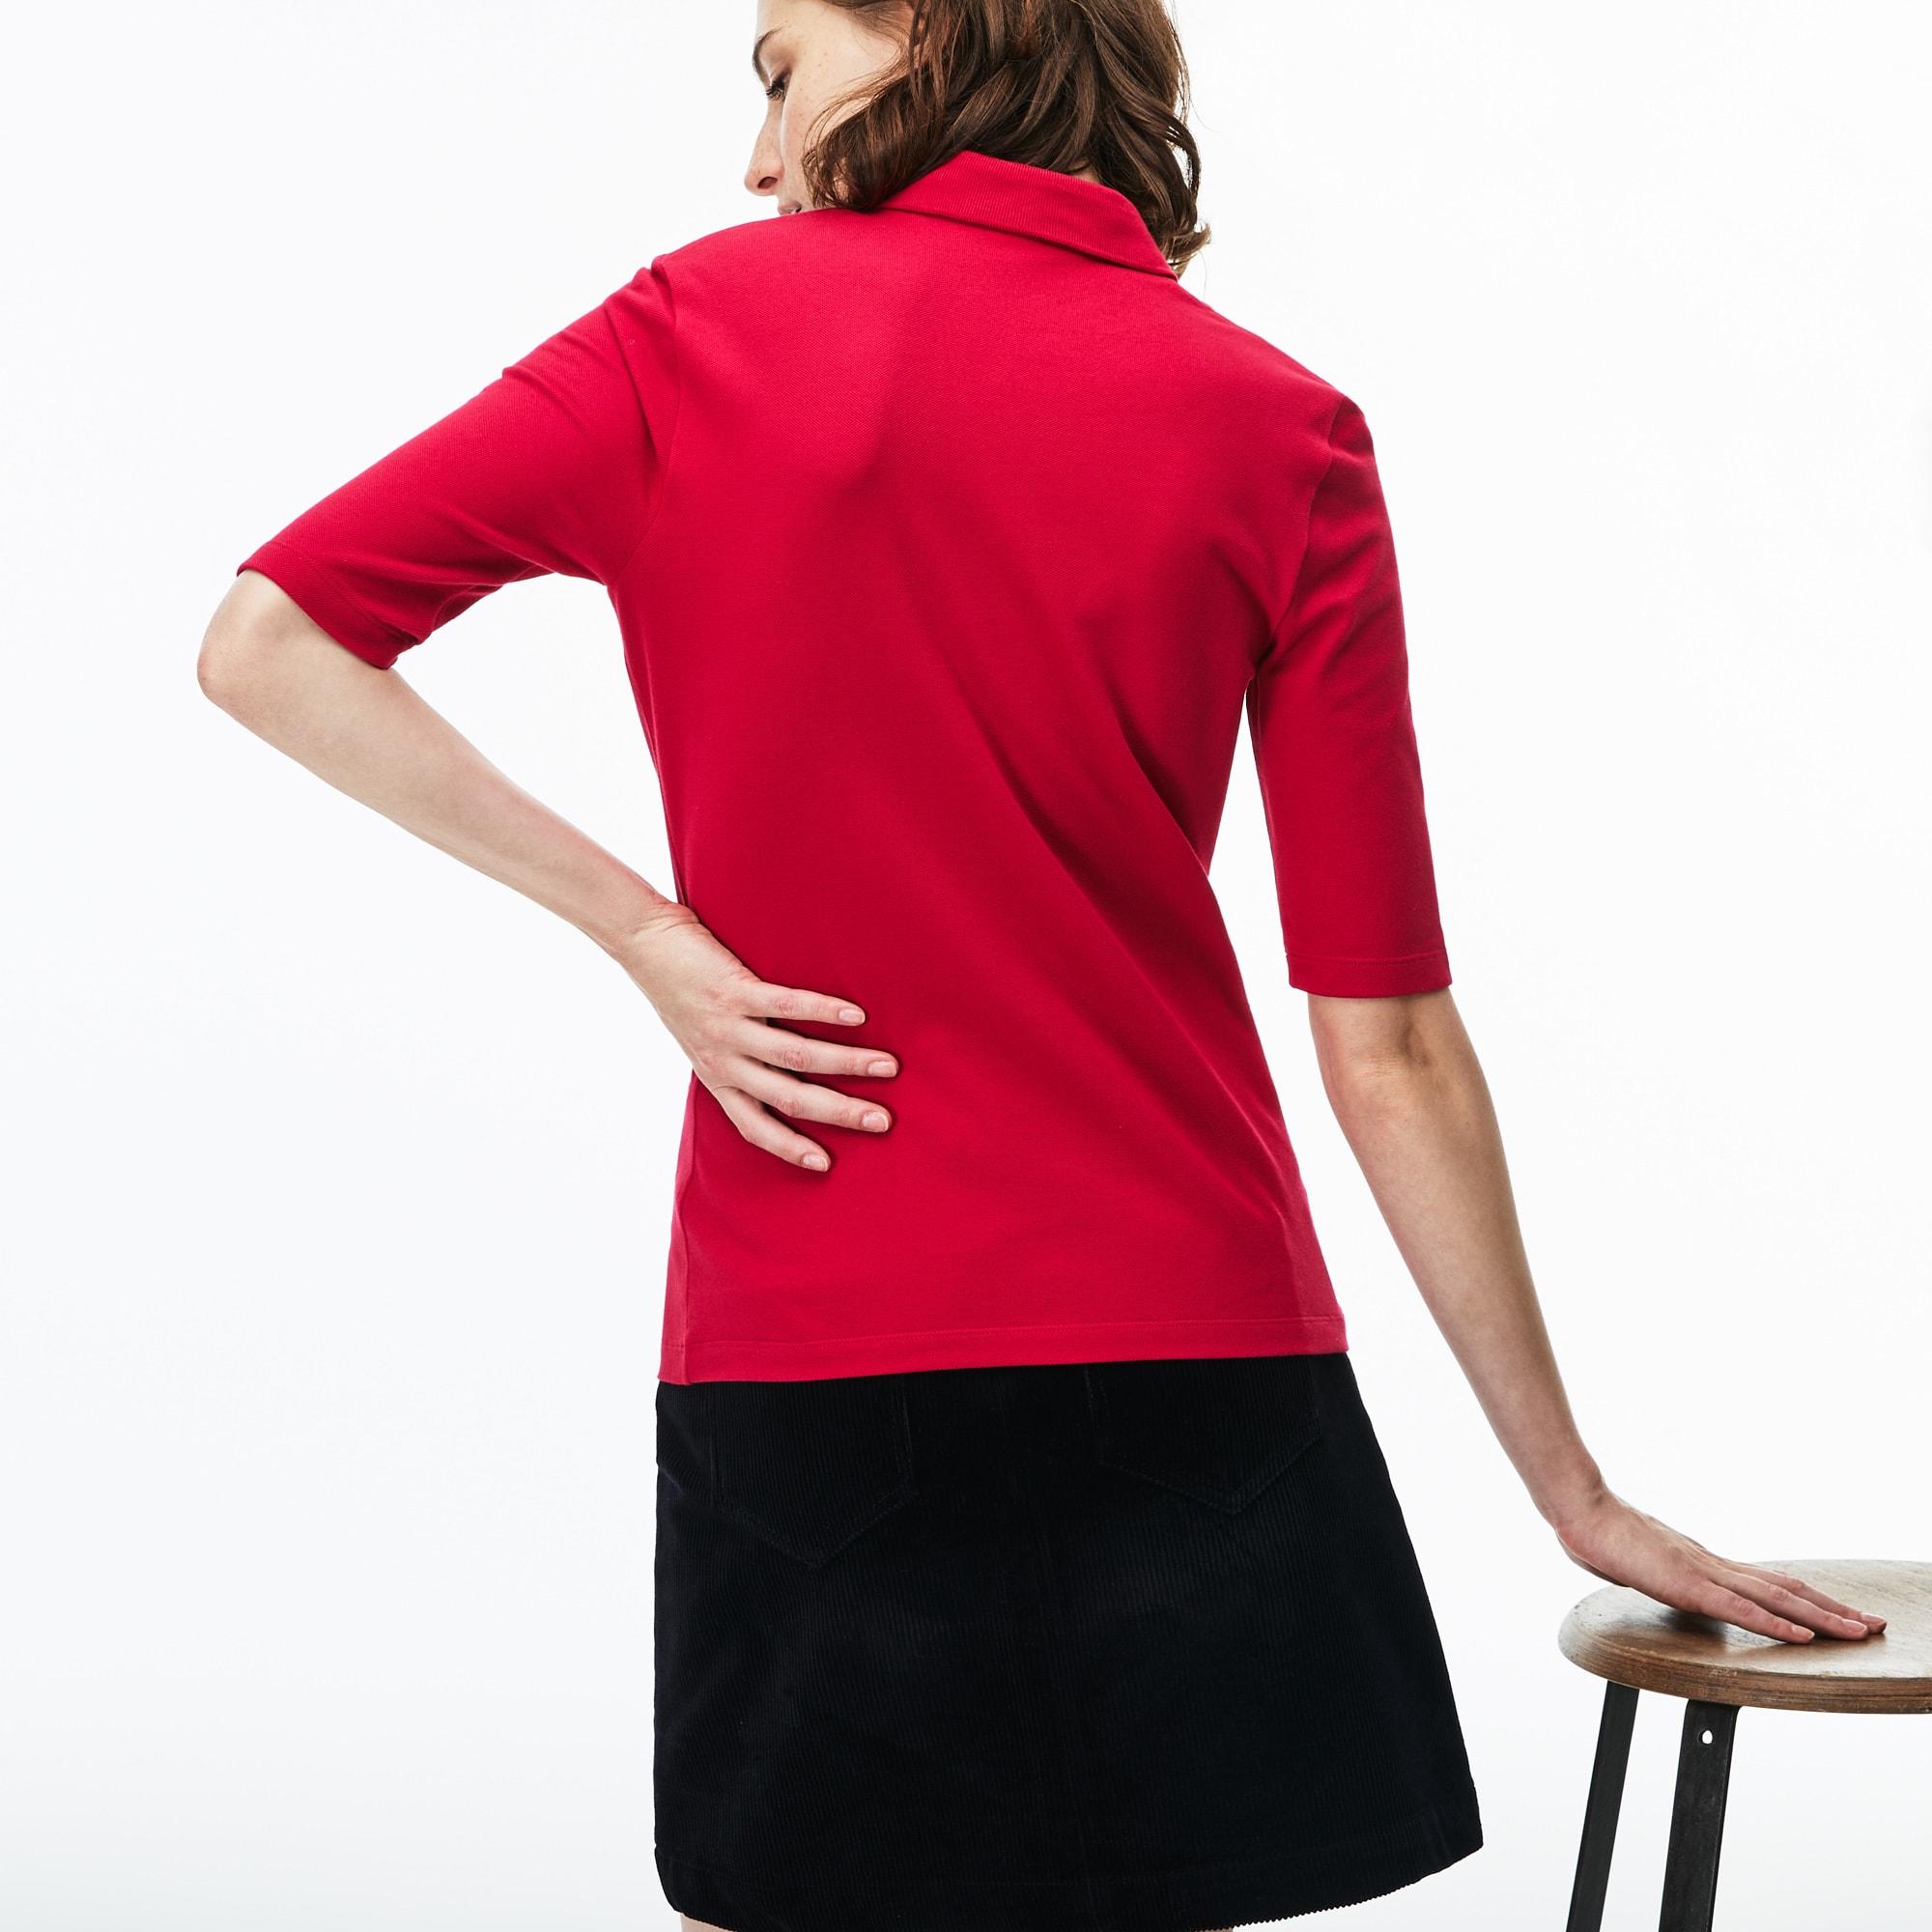 Lacoste Womens Slim Fit Stretch Mini Piqu Polo Shirt In Persian